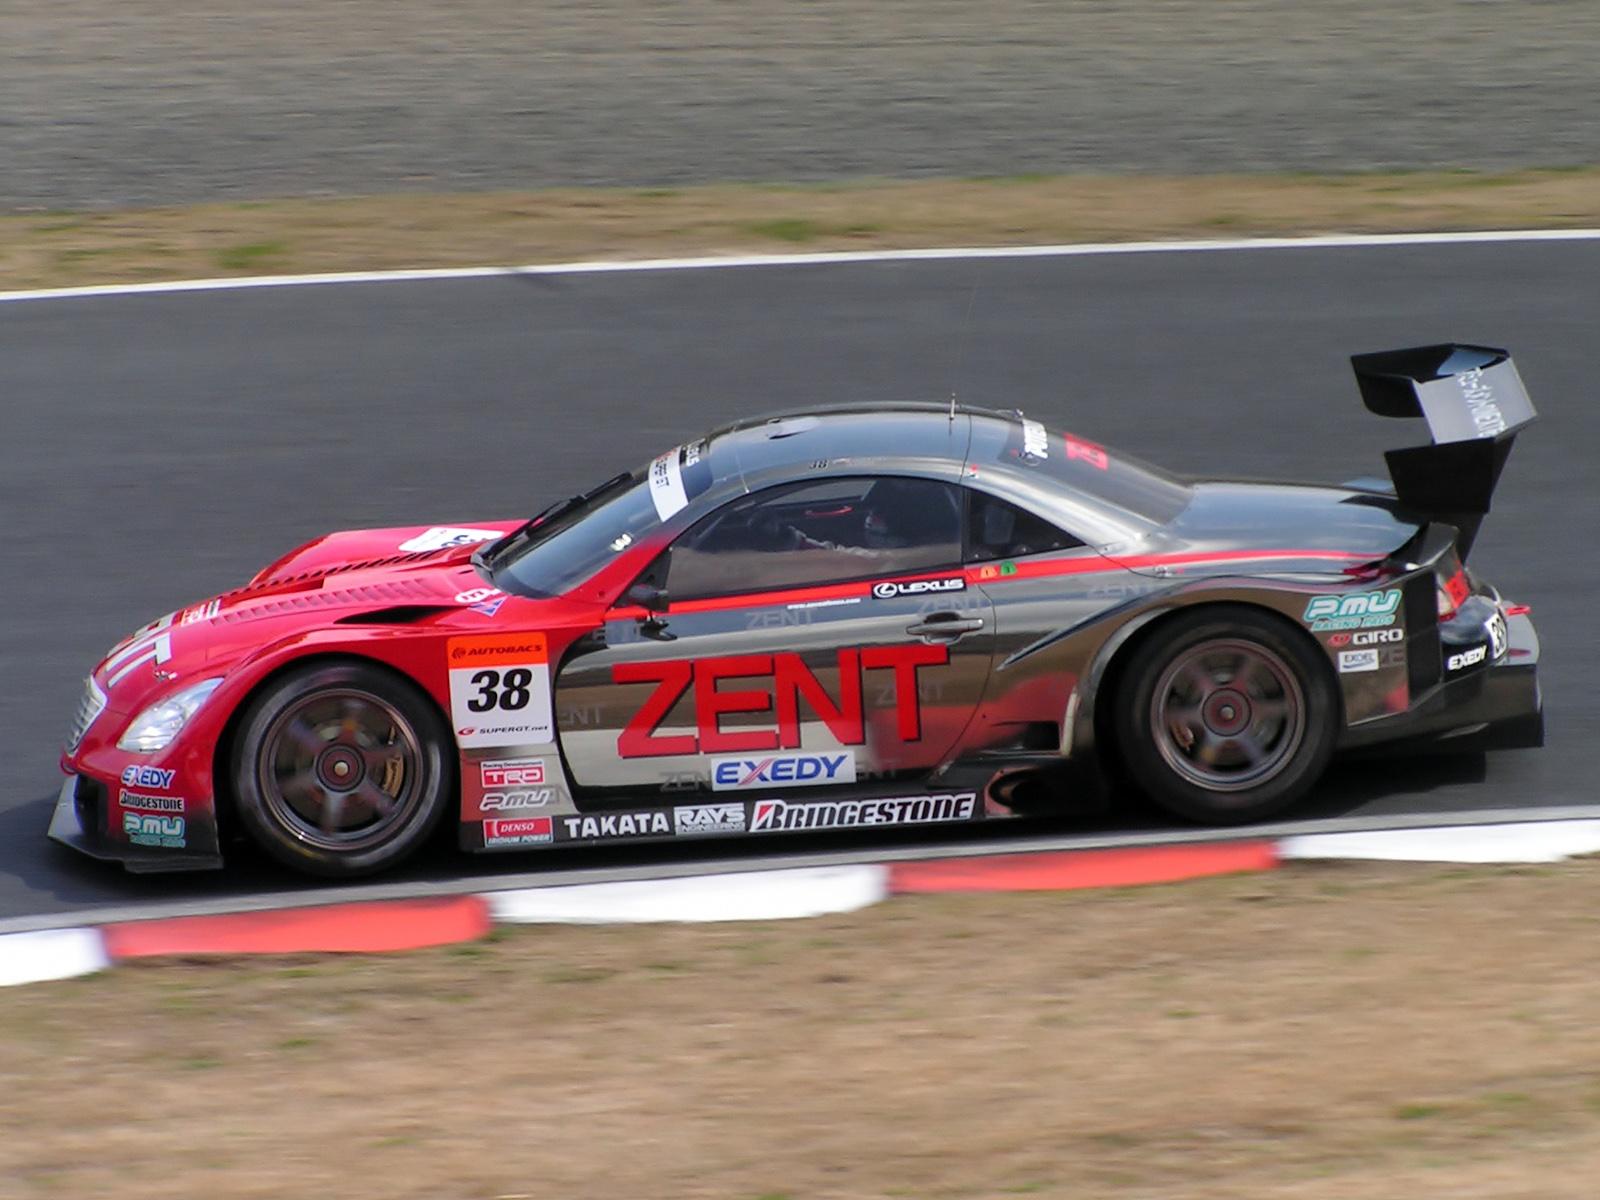 http://1.bp.blogspot.com/_o56-XkQKgV0/TDnmBibrV8I/AAAAAAAAAhw/hfNuFy9T45s/s1600/%2338_Lexus_SC430_01.jpg